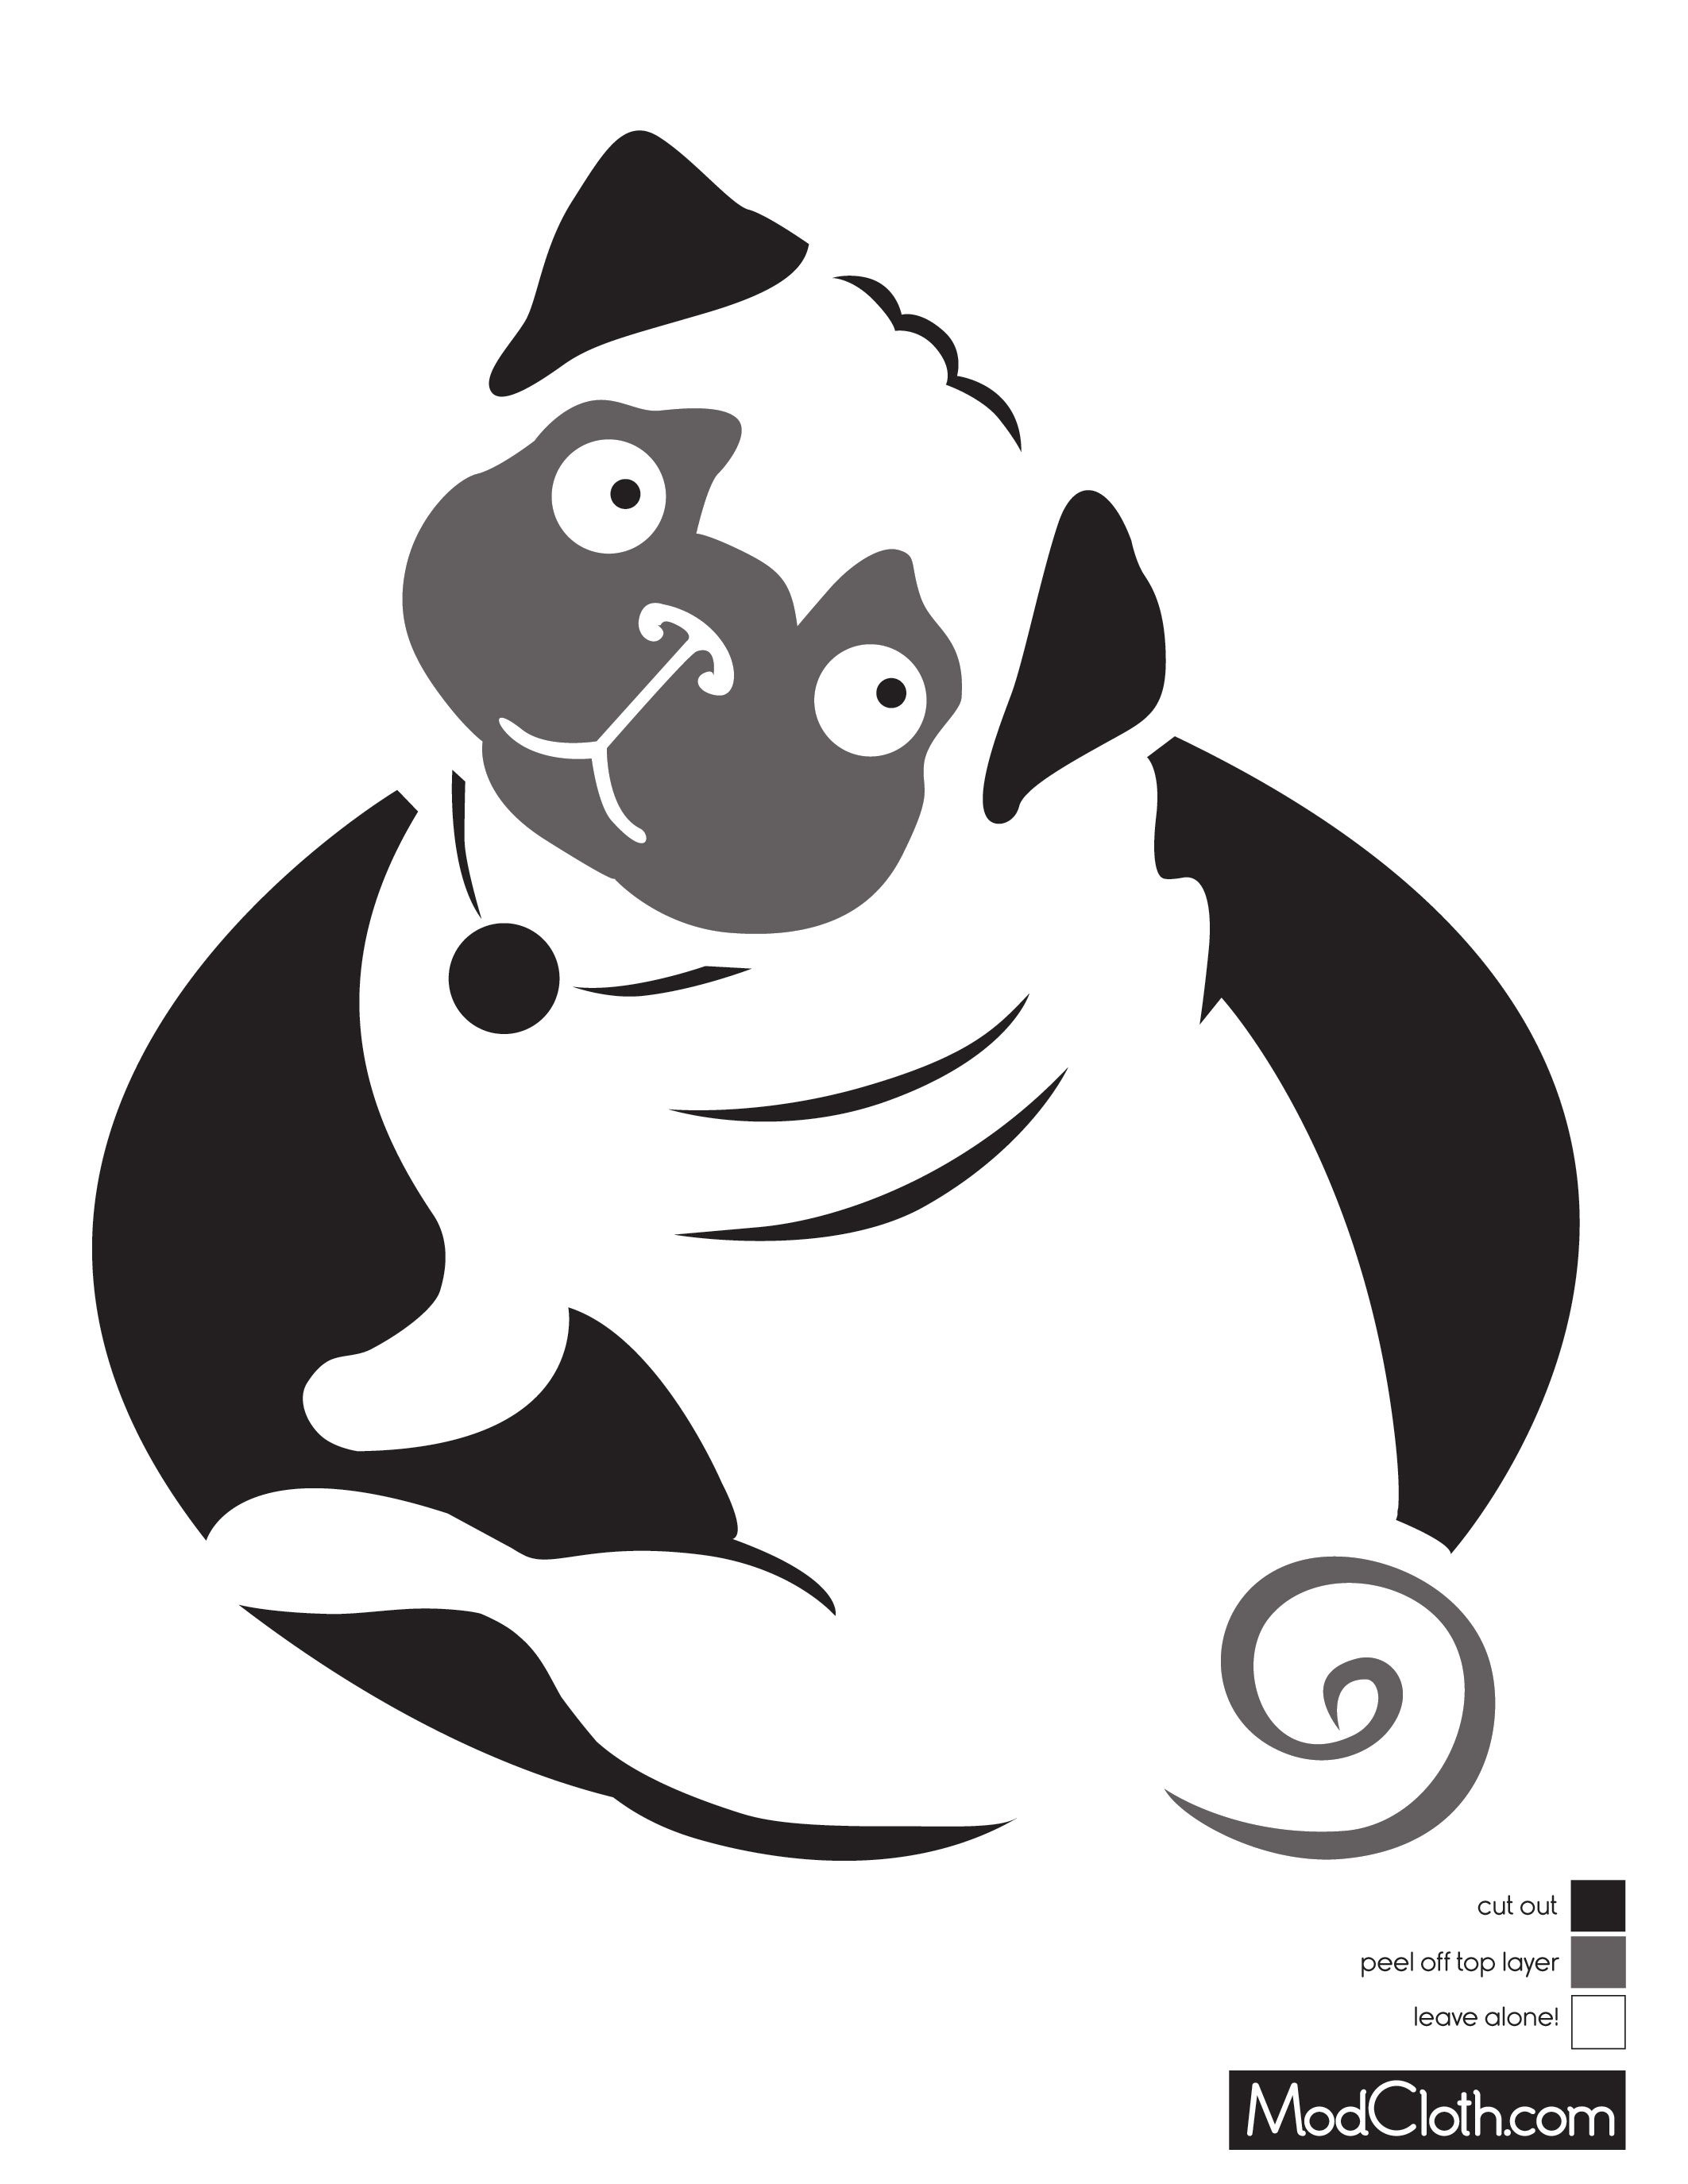 Pug Dog Silhouette Free Halloween Pumpkin Carving Stencil Design - Free Printable Pumpkin Carving Templates Dog